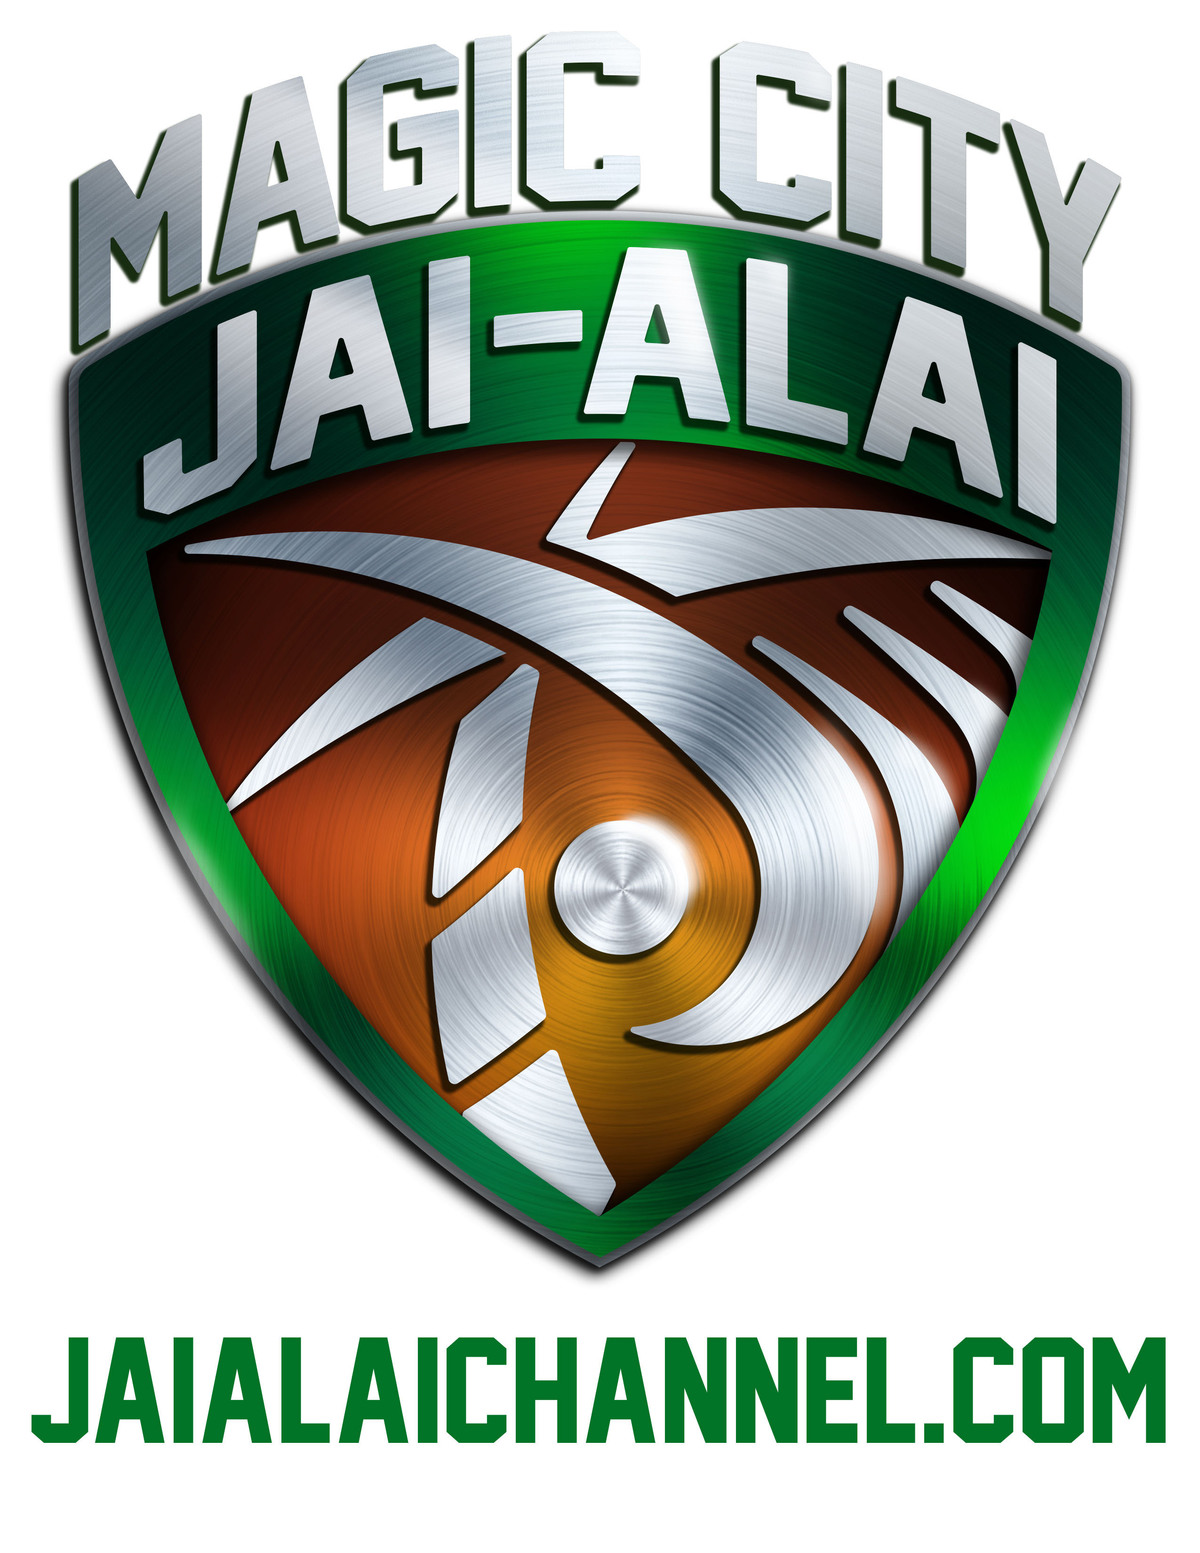 Jai-Alai H2H - Doubles H2H - Sat. Jun 19, 2021